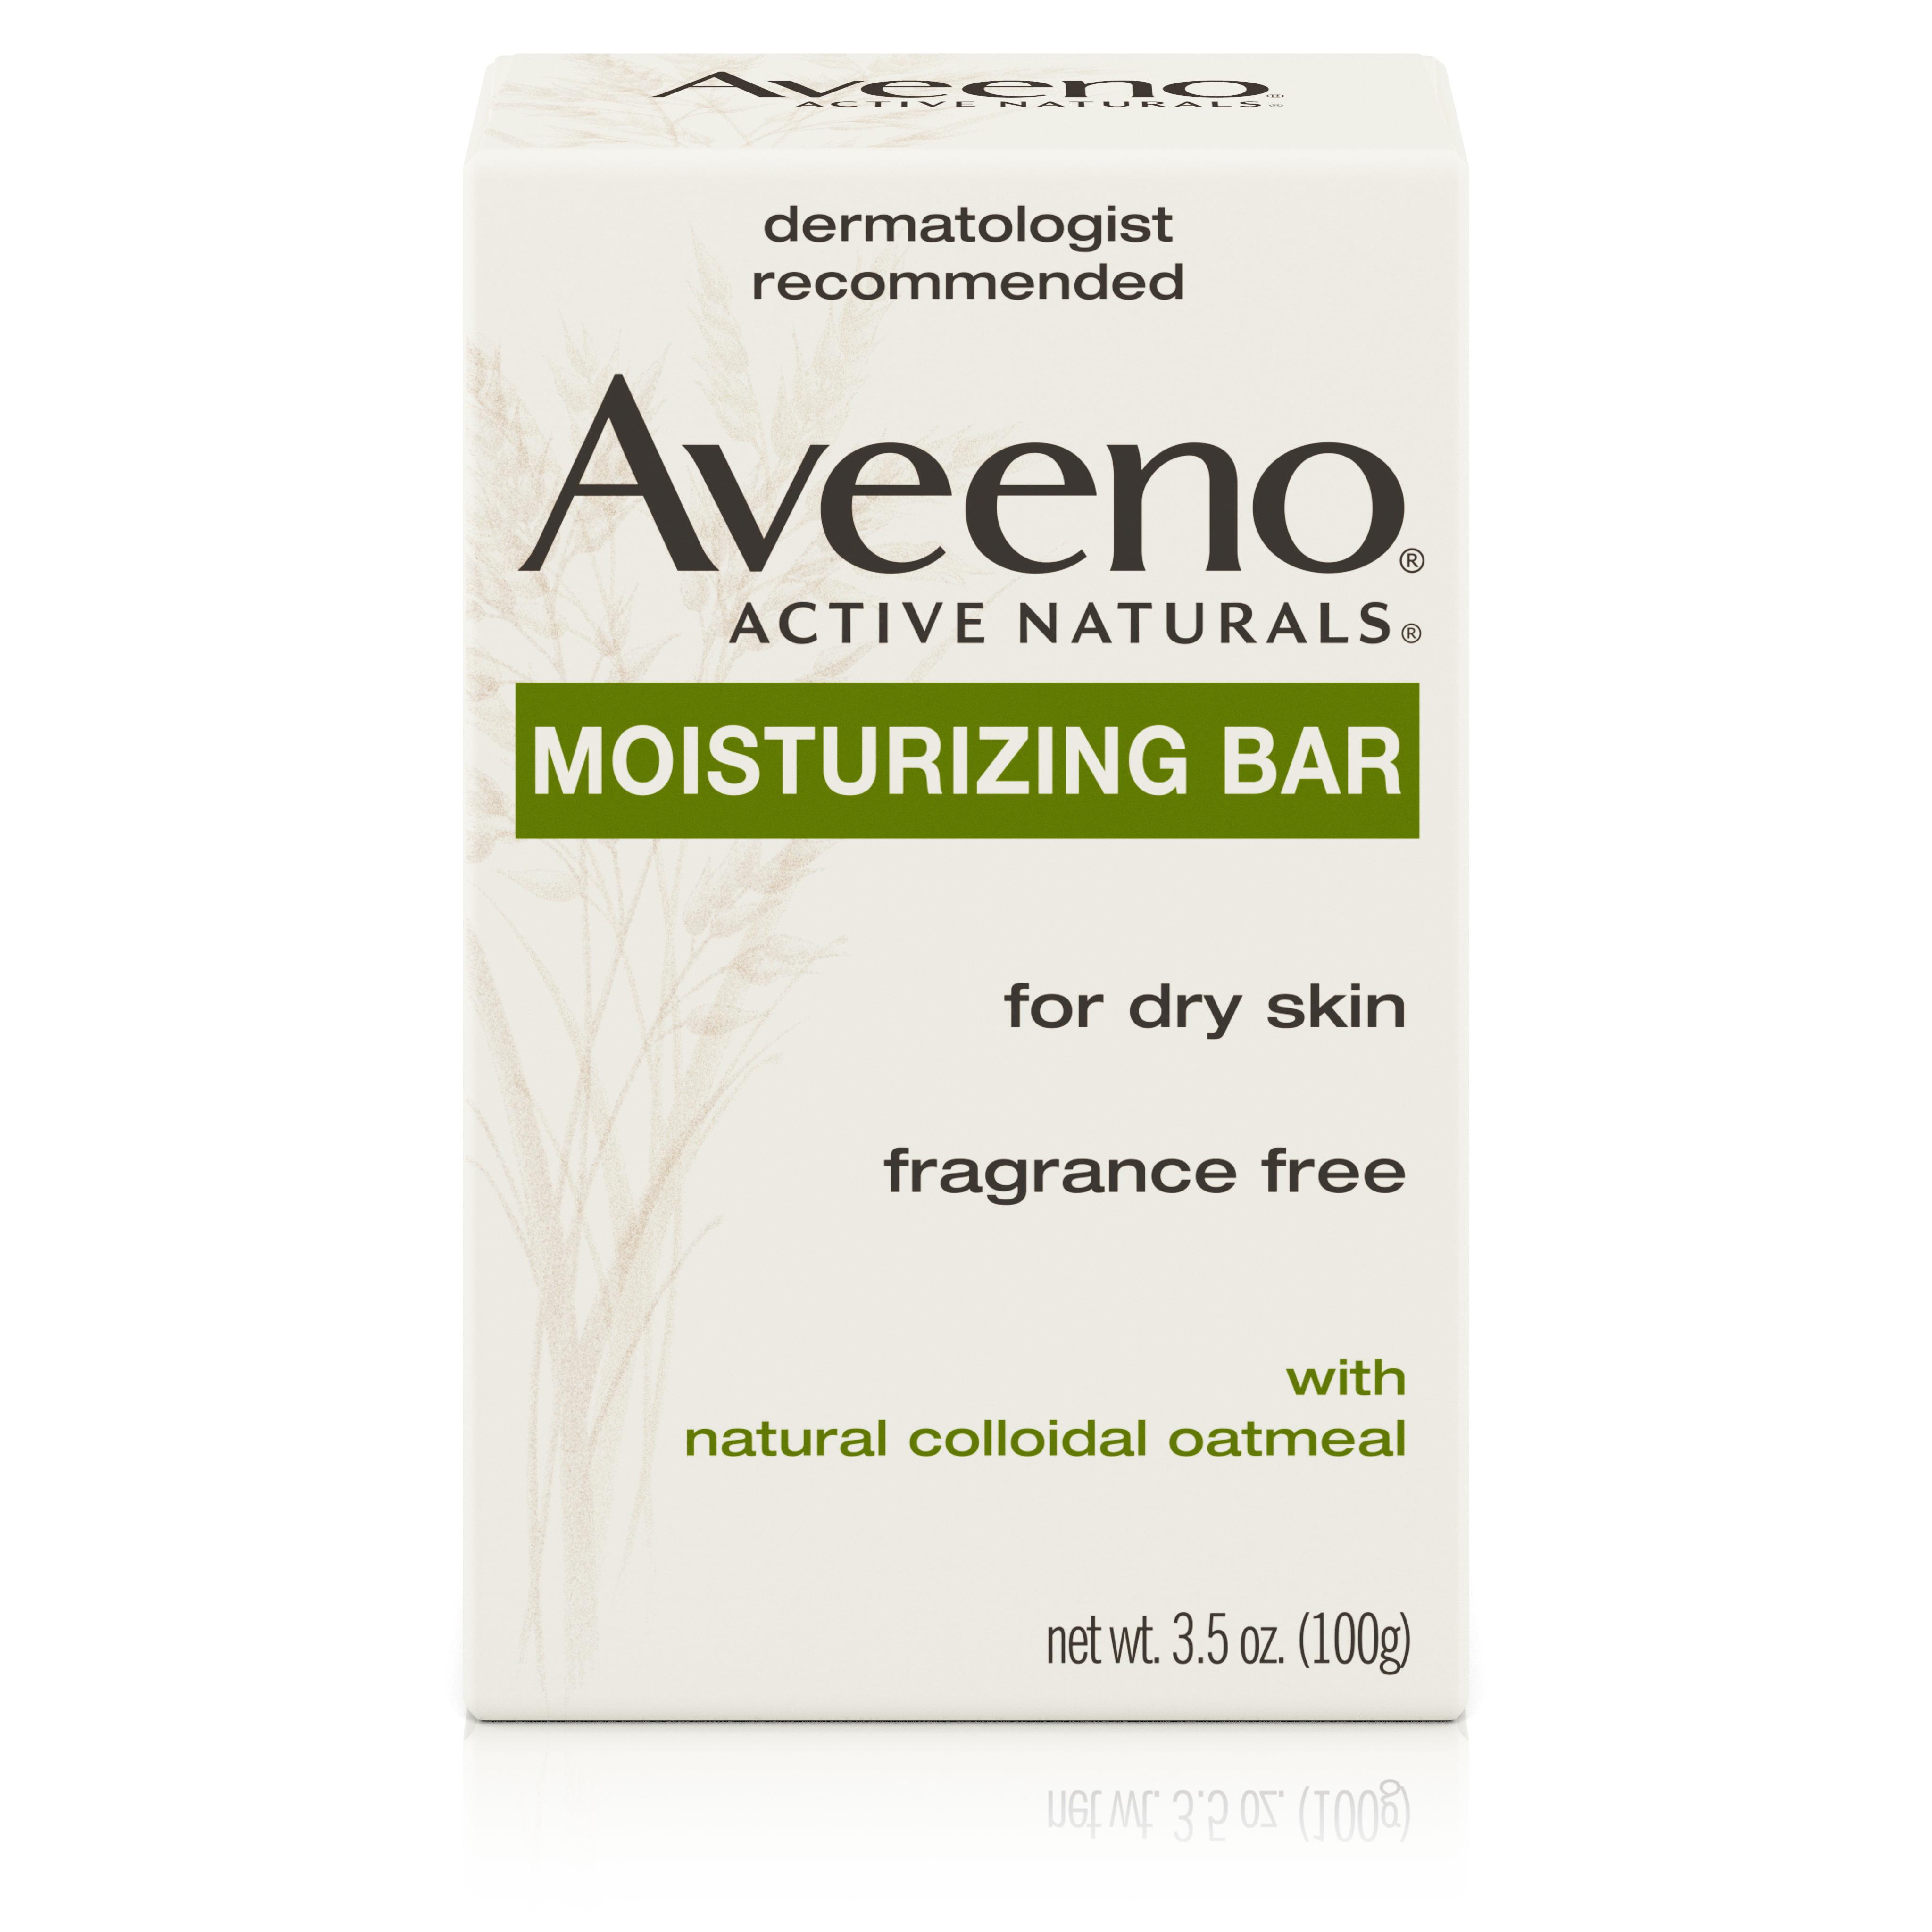 Gentle Moisturizing Bar Facial Cleanser for Dry Skin, 3 5 oz